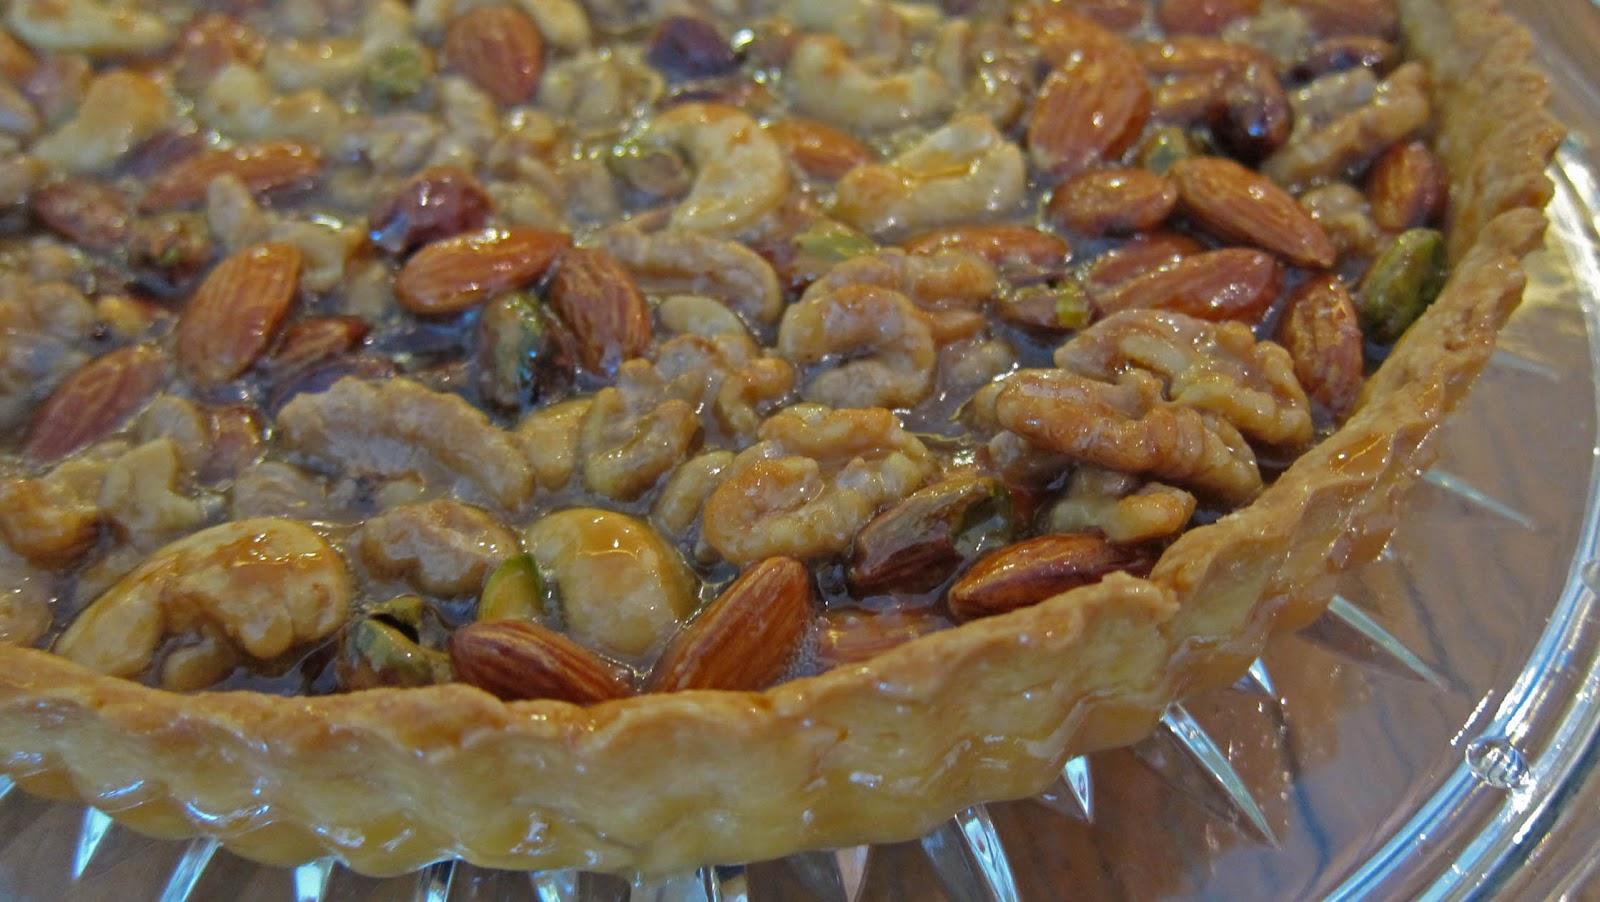 Pastry School Diaries: Caramel Nut Tart